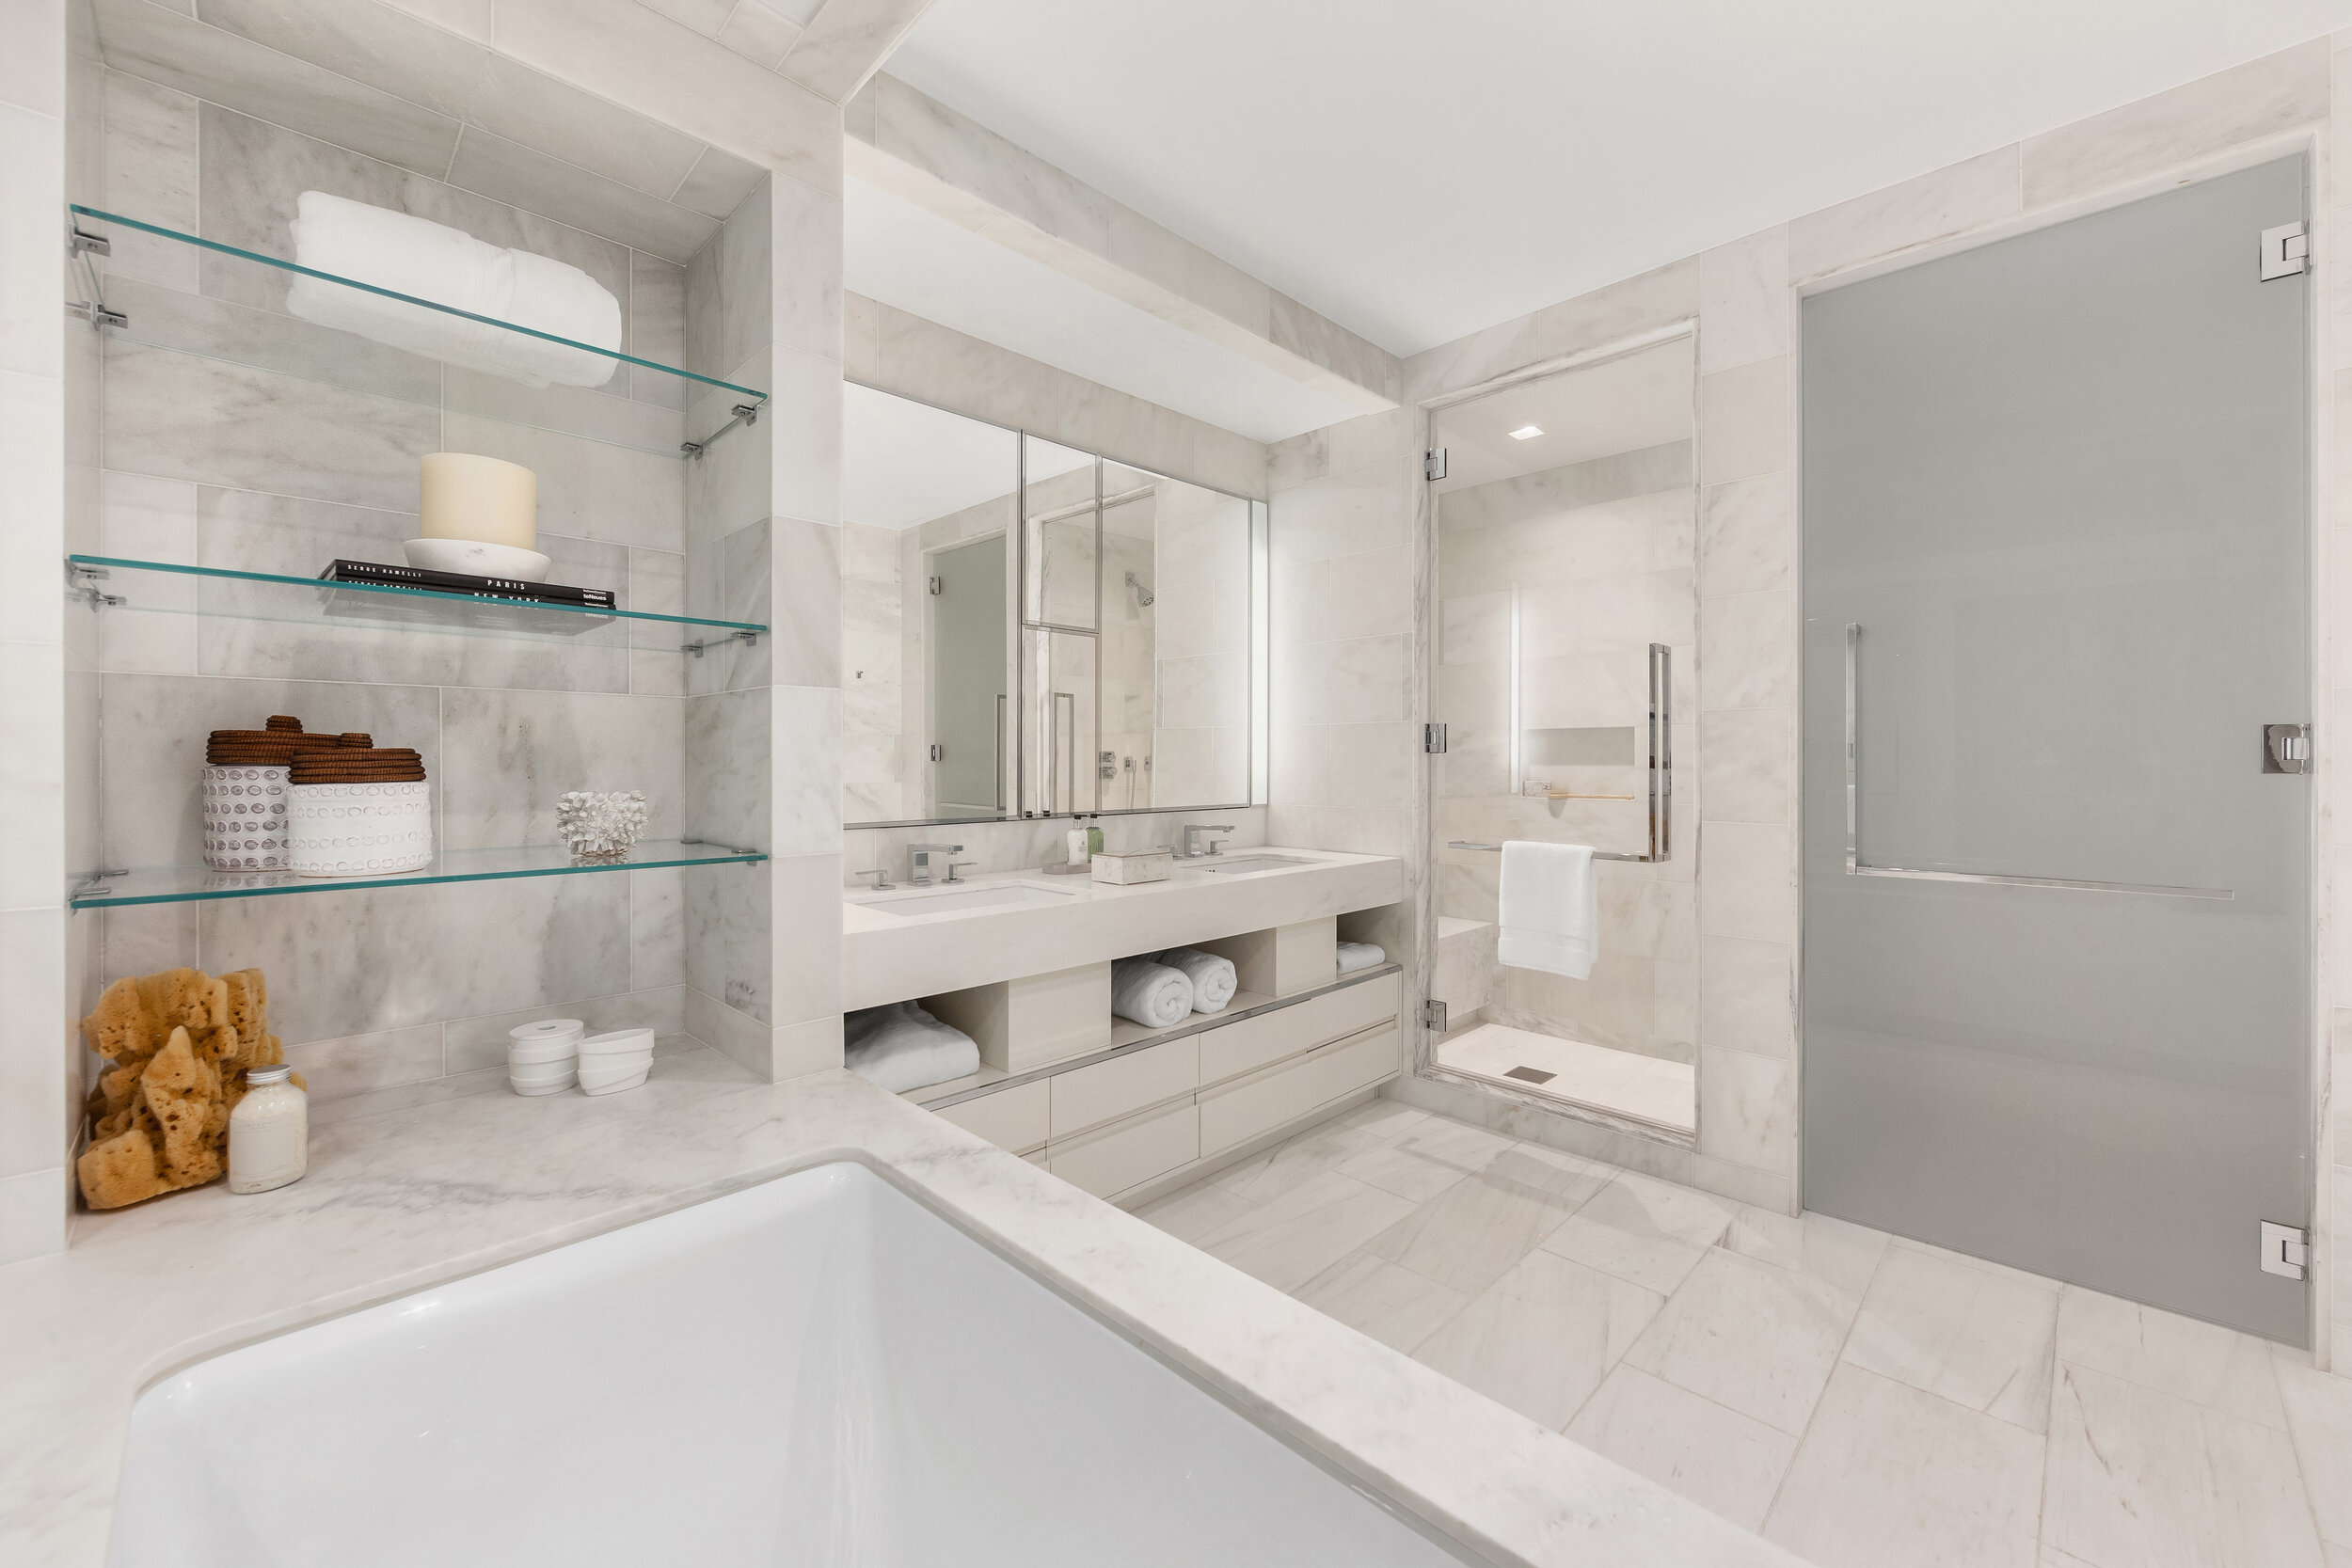 6A Bathroom High Res.jpg